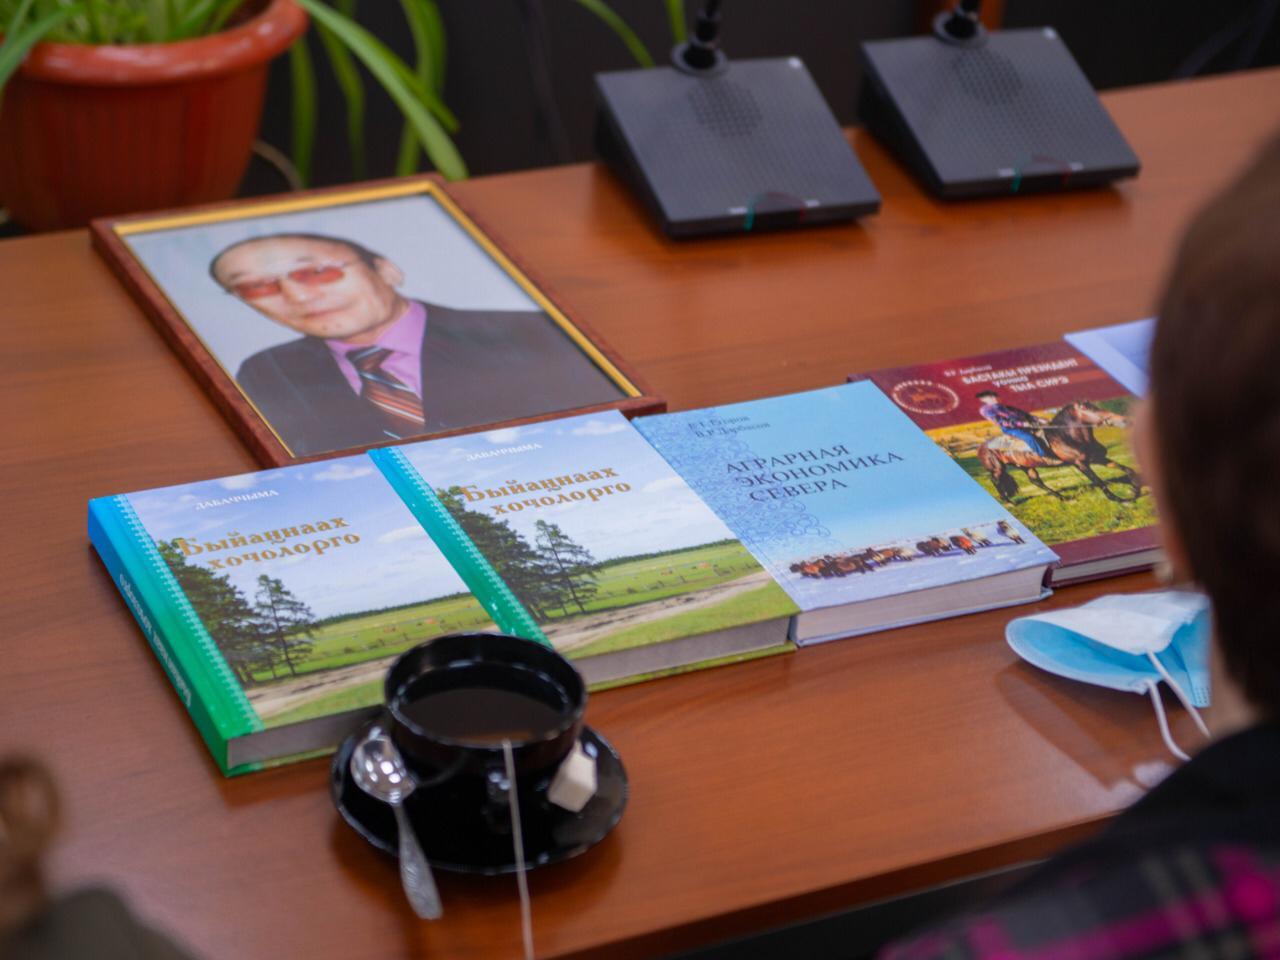 Экономическому факультету АГАТУ присвоено имя первого декана Василия Дарбасова